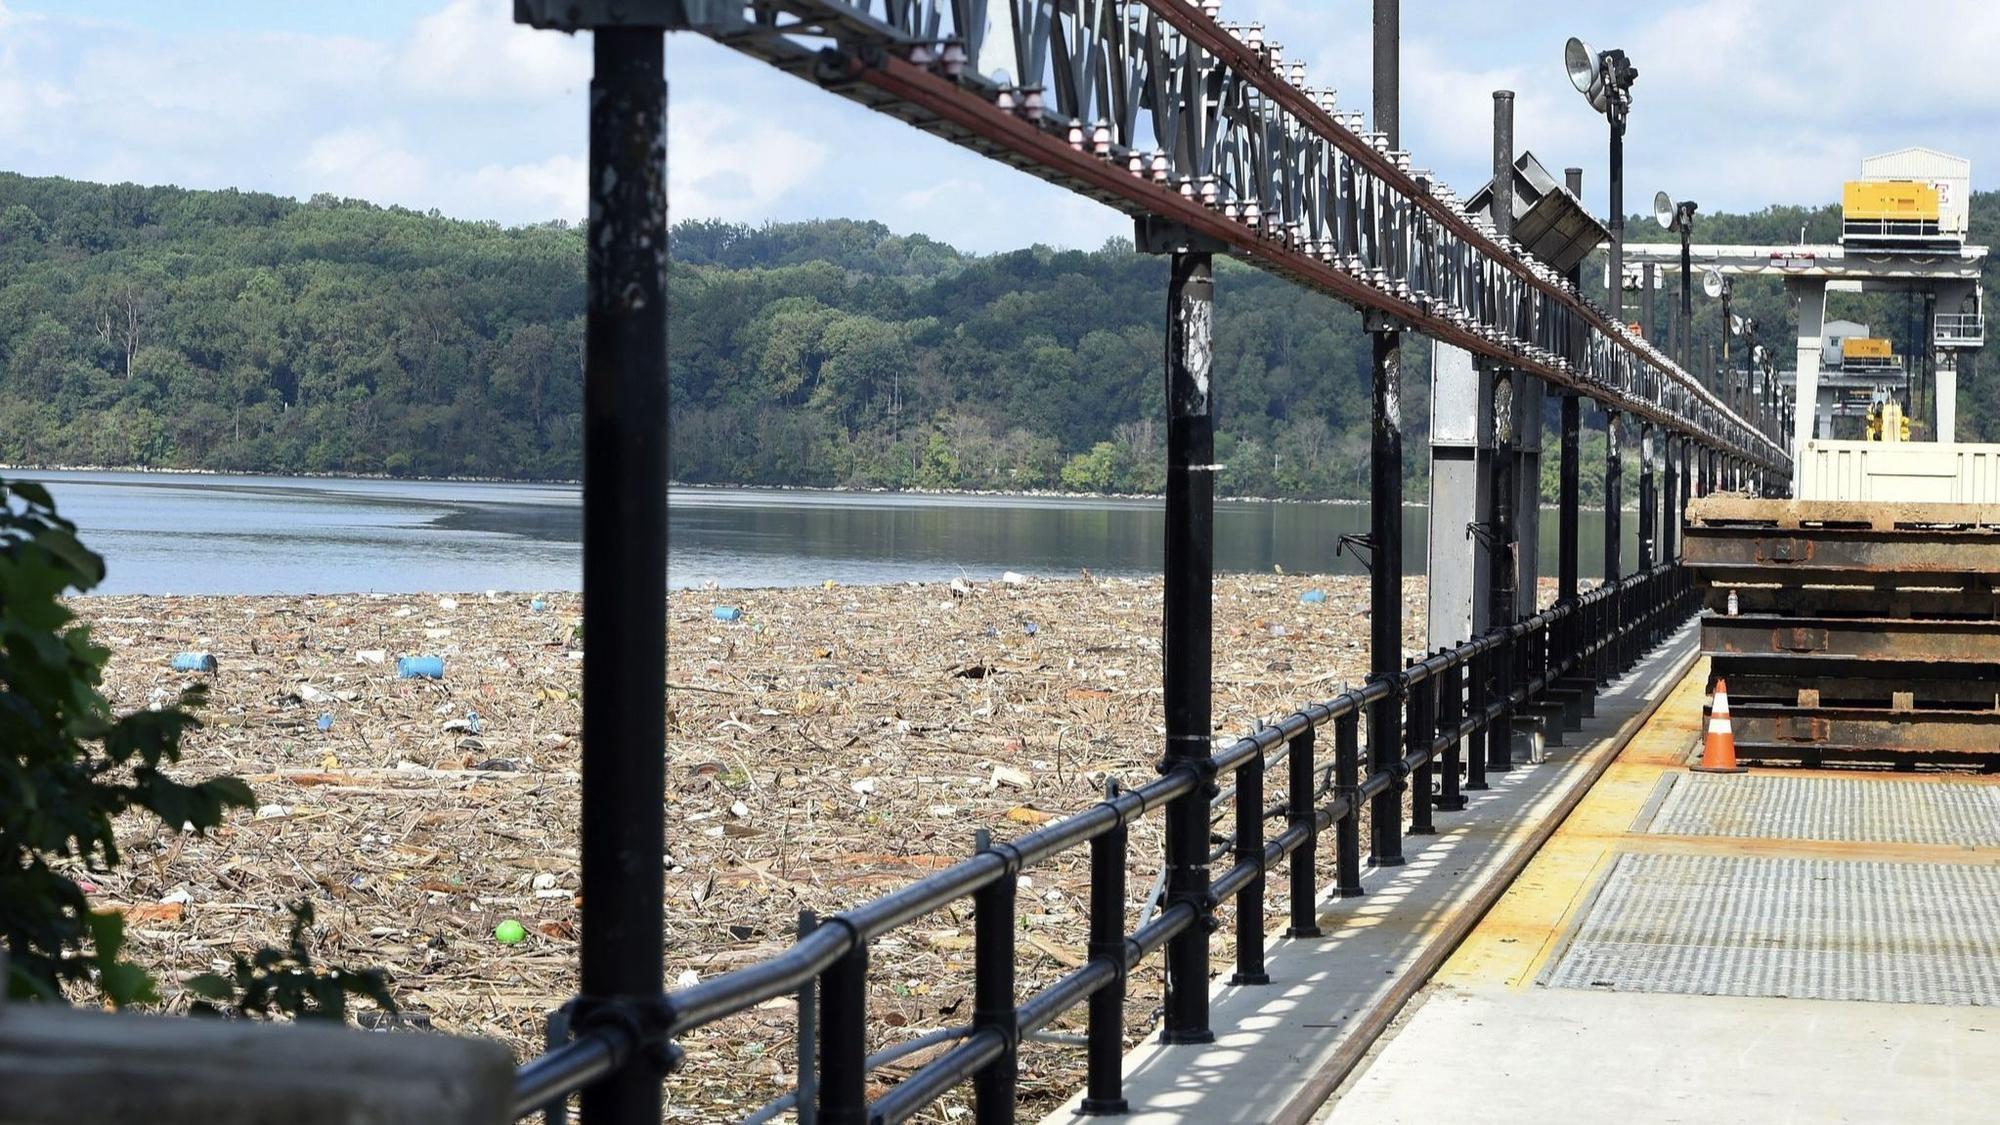 After rainy November, Maryland's Conowingo Dam opens flood crest gates 'until further notice'